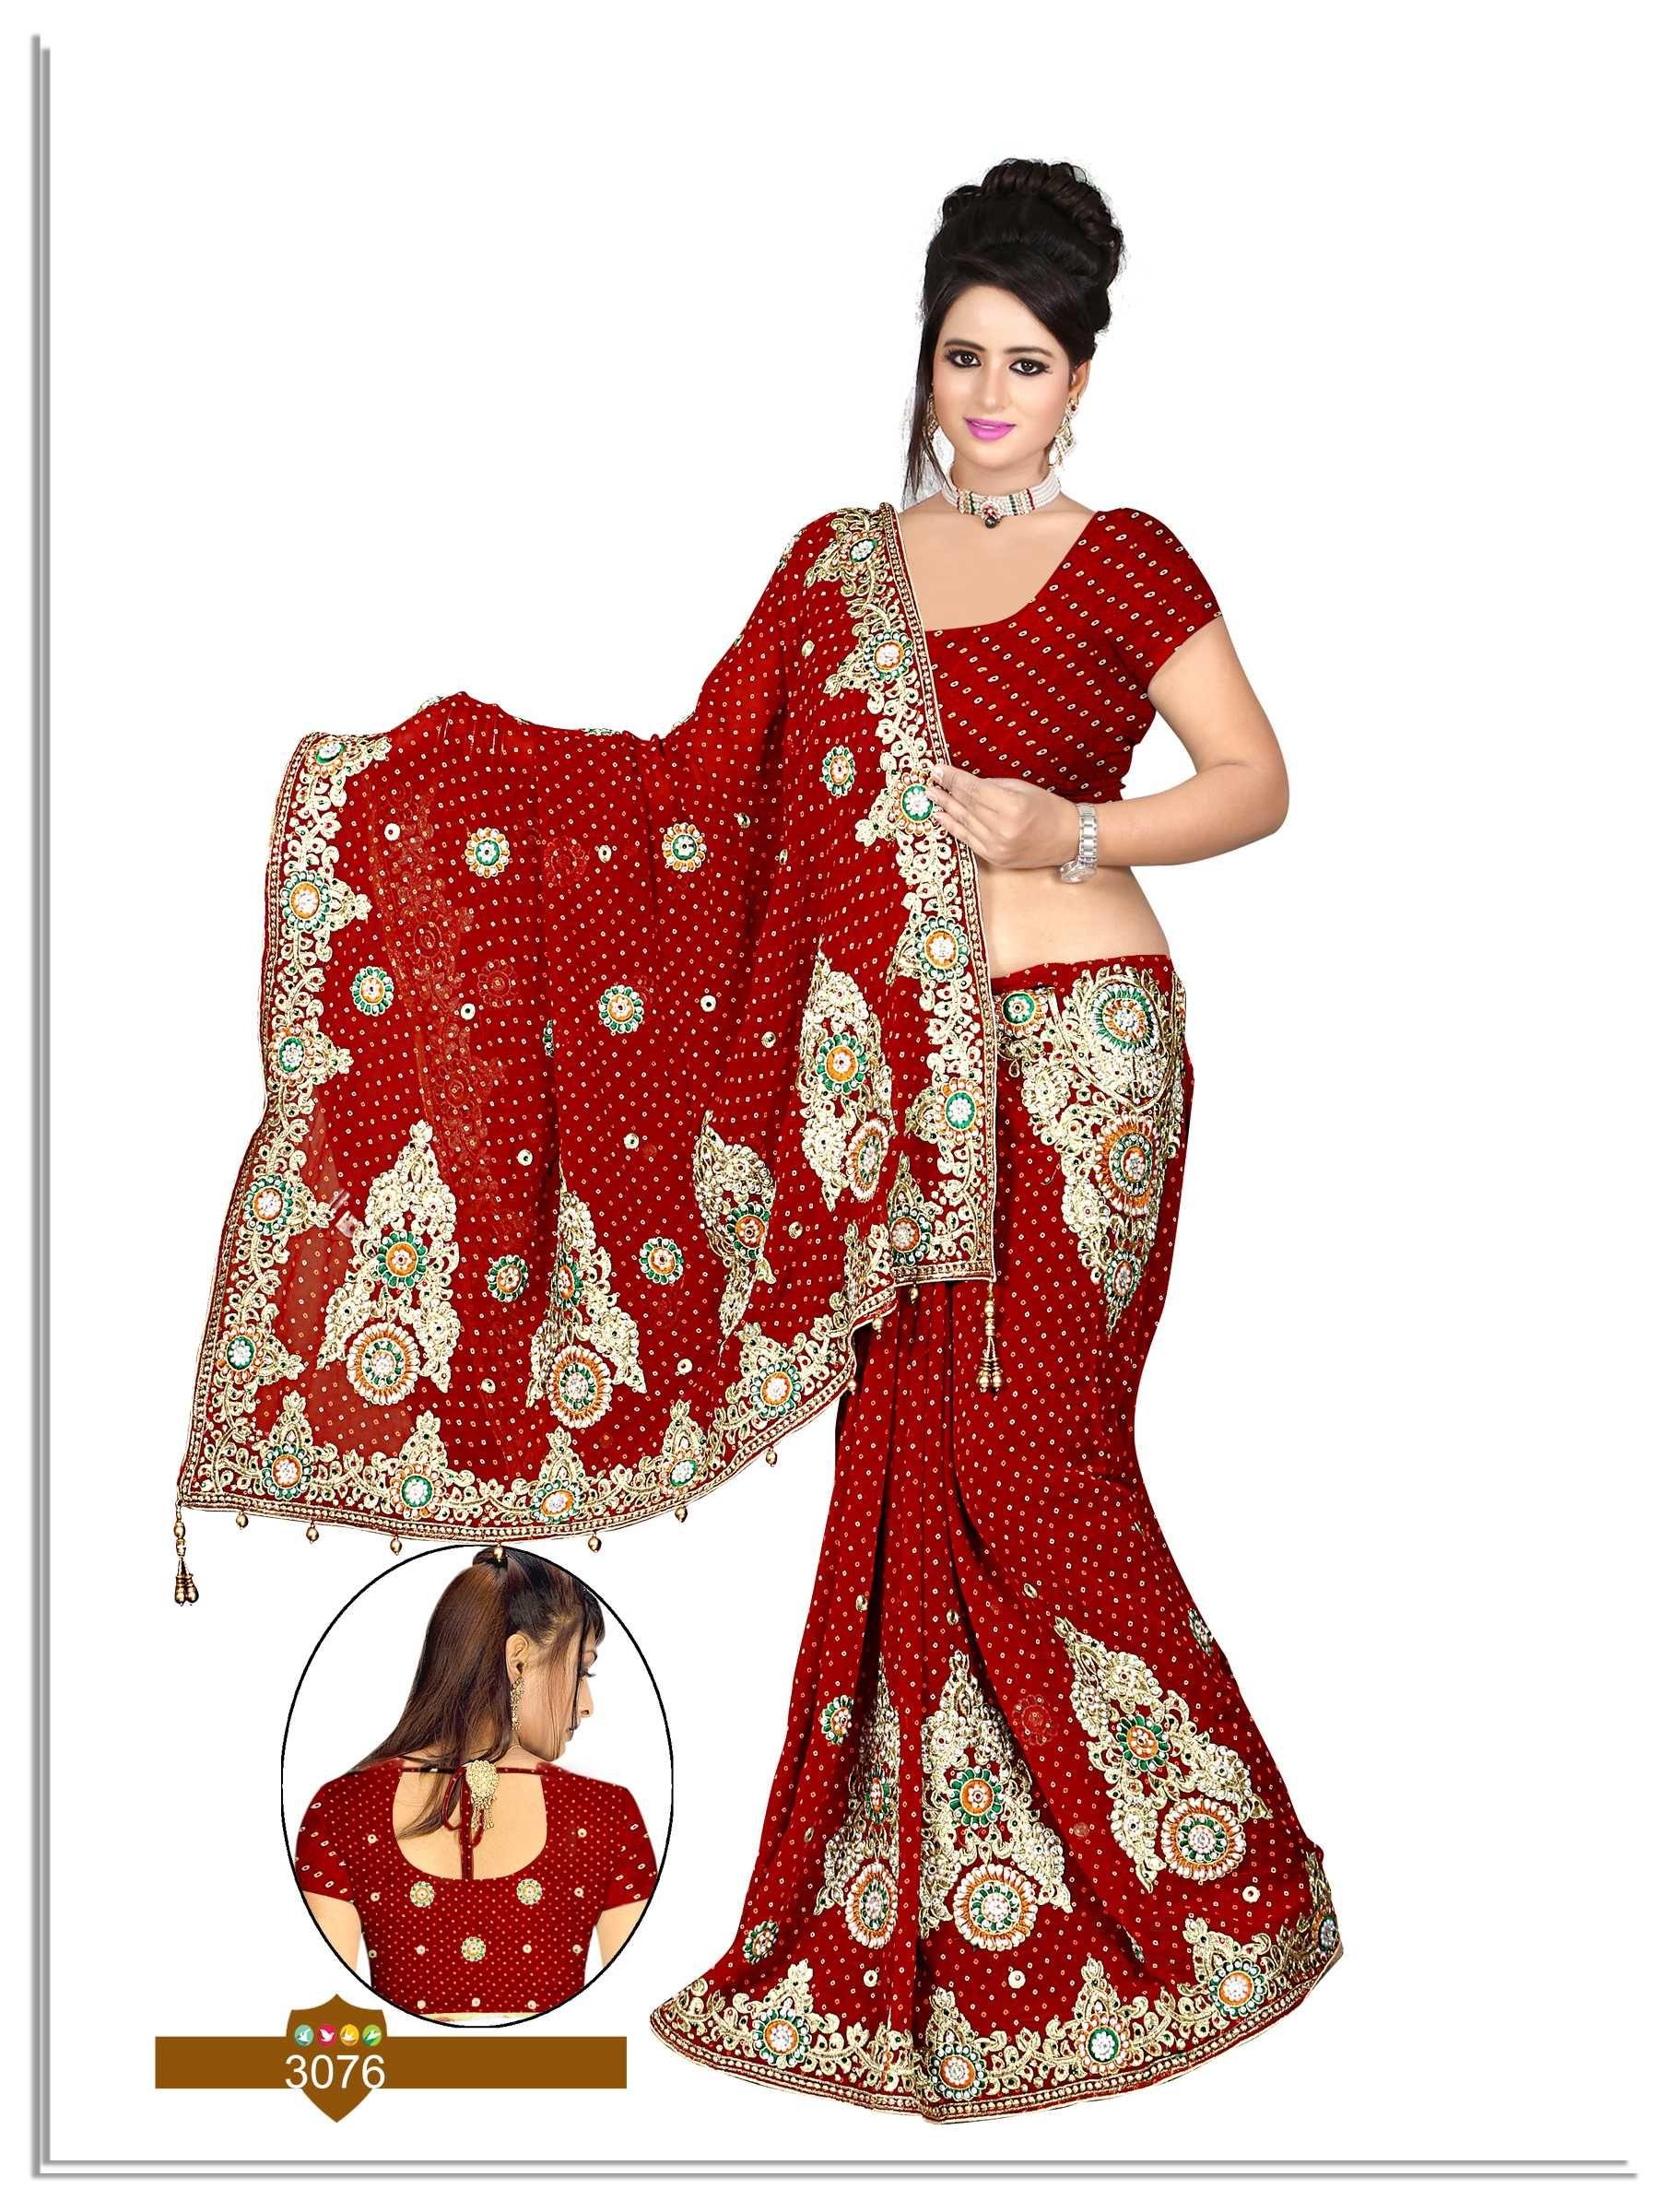 436249c0c3 This #heavy #Designer #work #bandhani, #Bandhej, #Chunari, #wedding,  #gharchola #saree are in #Georgette, #Viscose and #Jaquard fabrics. Work on  this saree ...